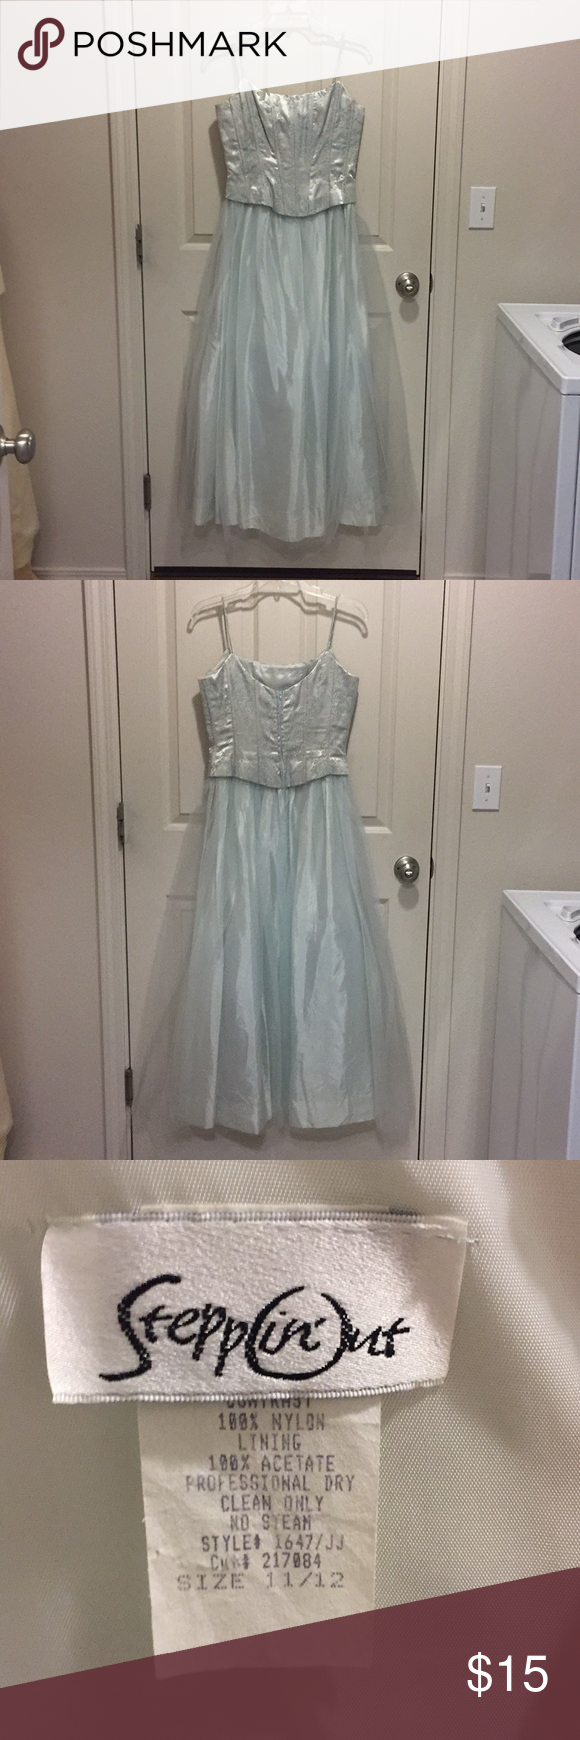 Formal Gown Vintage Worn Twice In 1999 Formal Gowns Gowns Vintage Wear [ 1740 x 580 Pixel ]